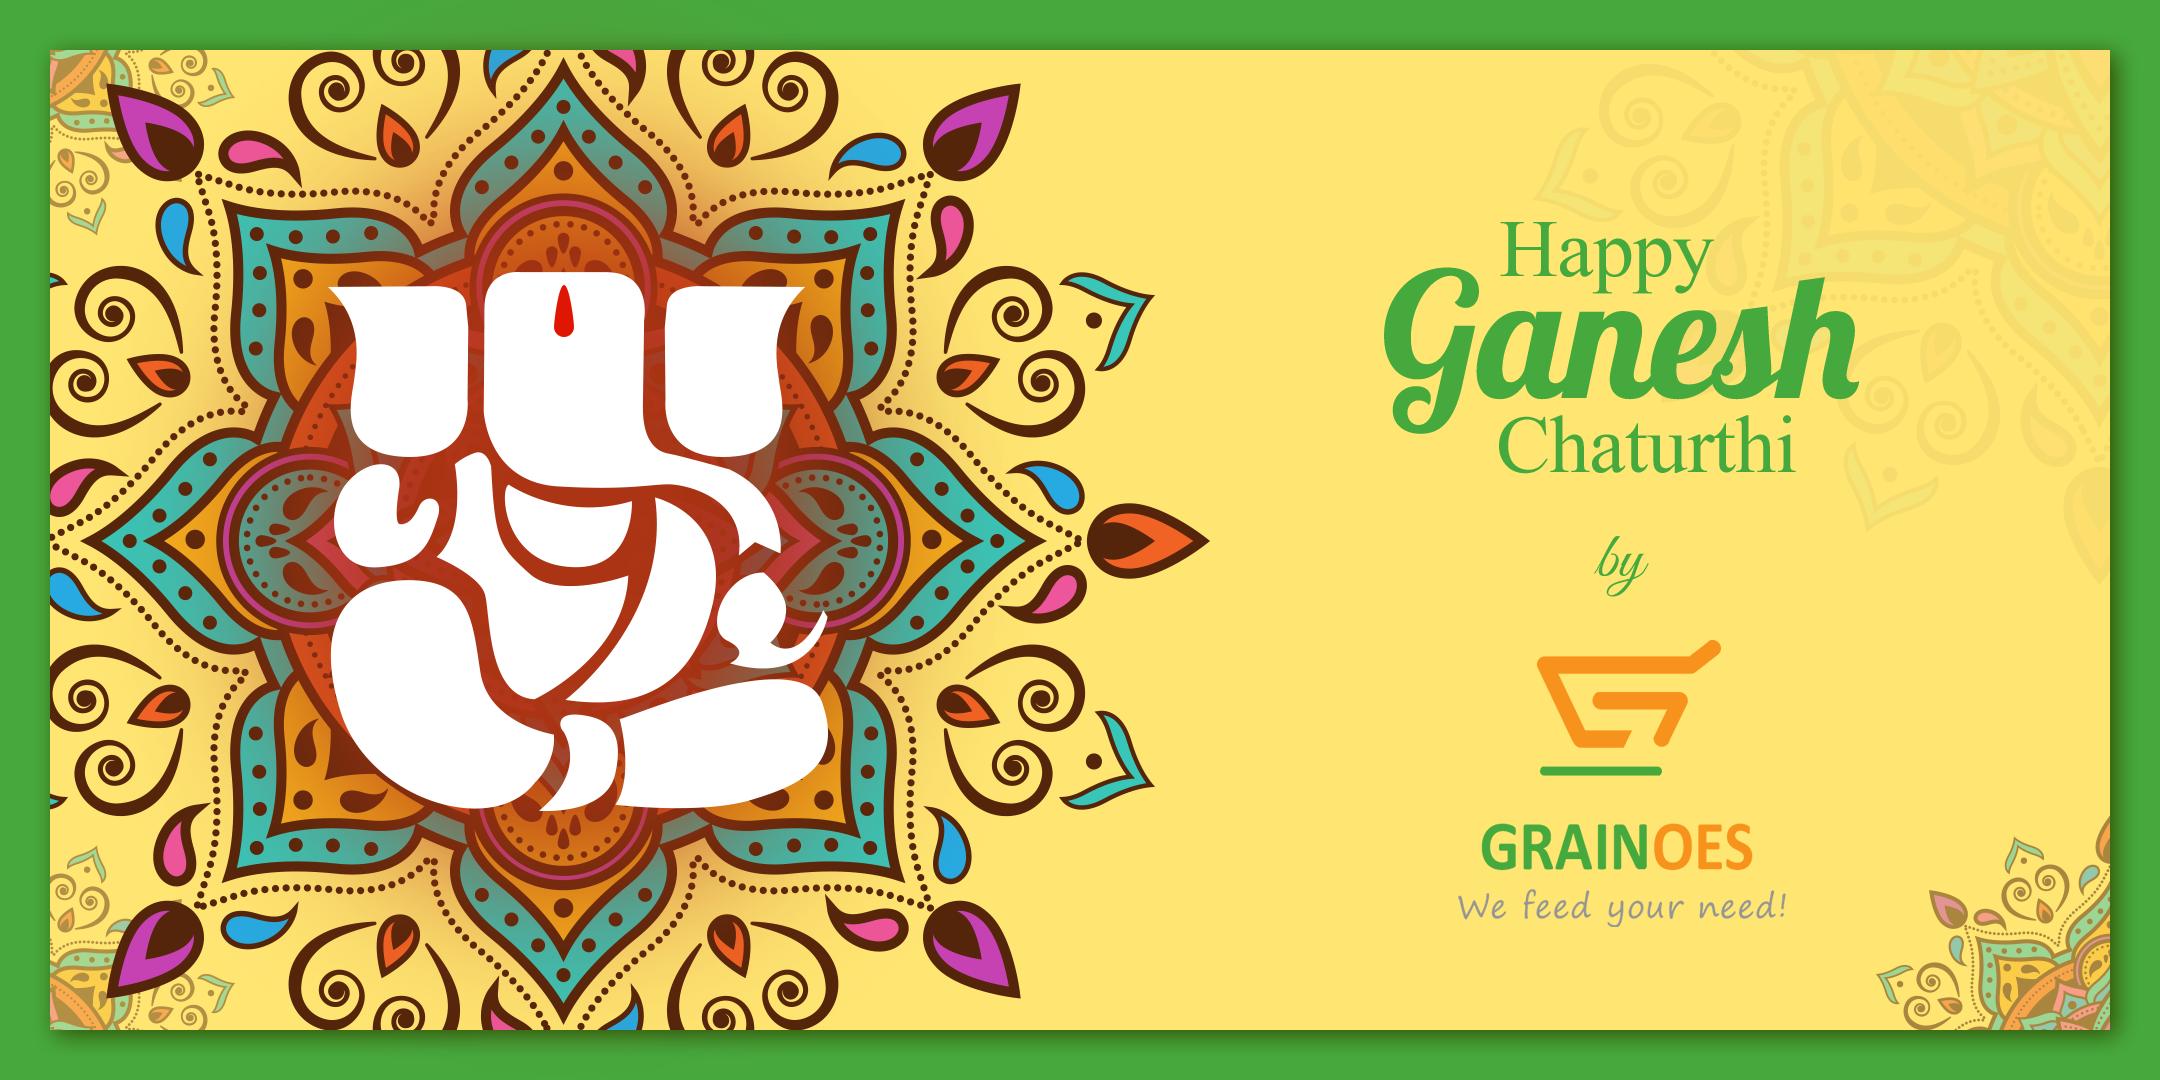 Make an Auspicious start this Ganesh Chaturthi with